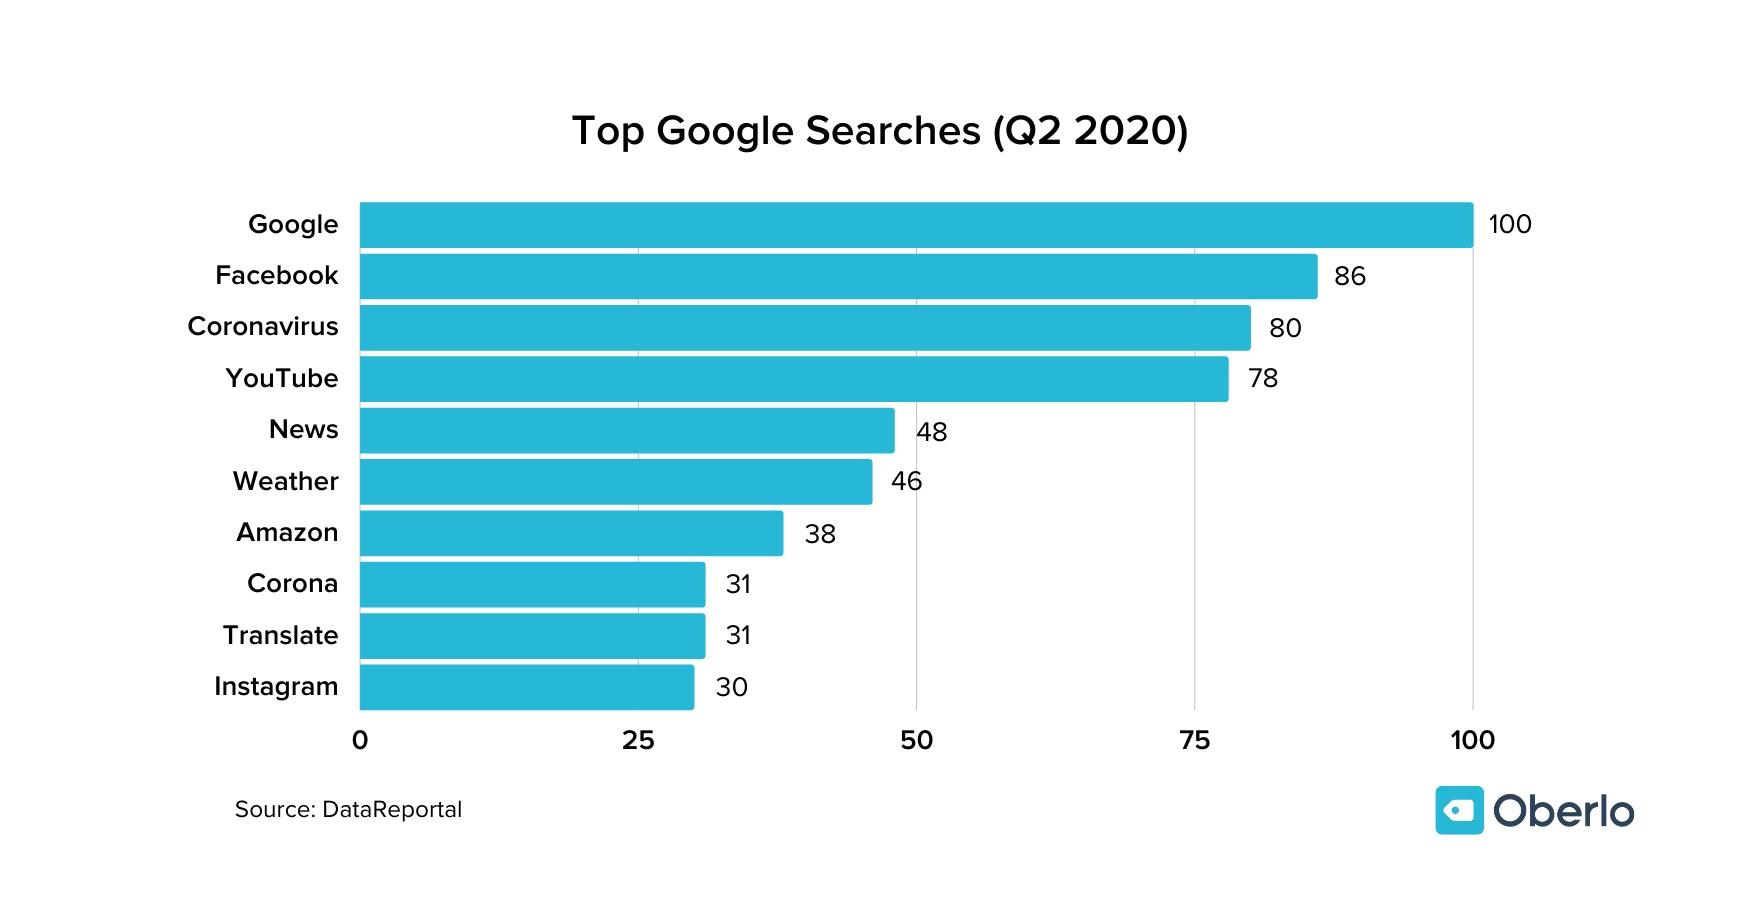 Top Google Searches graph